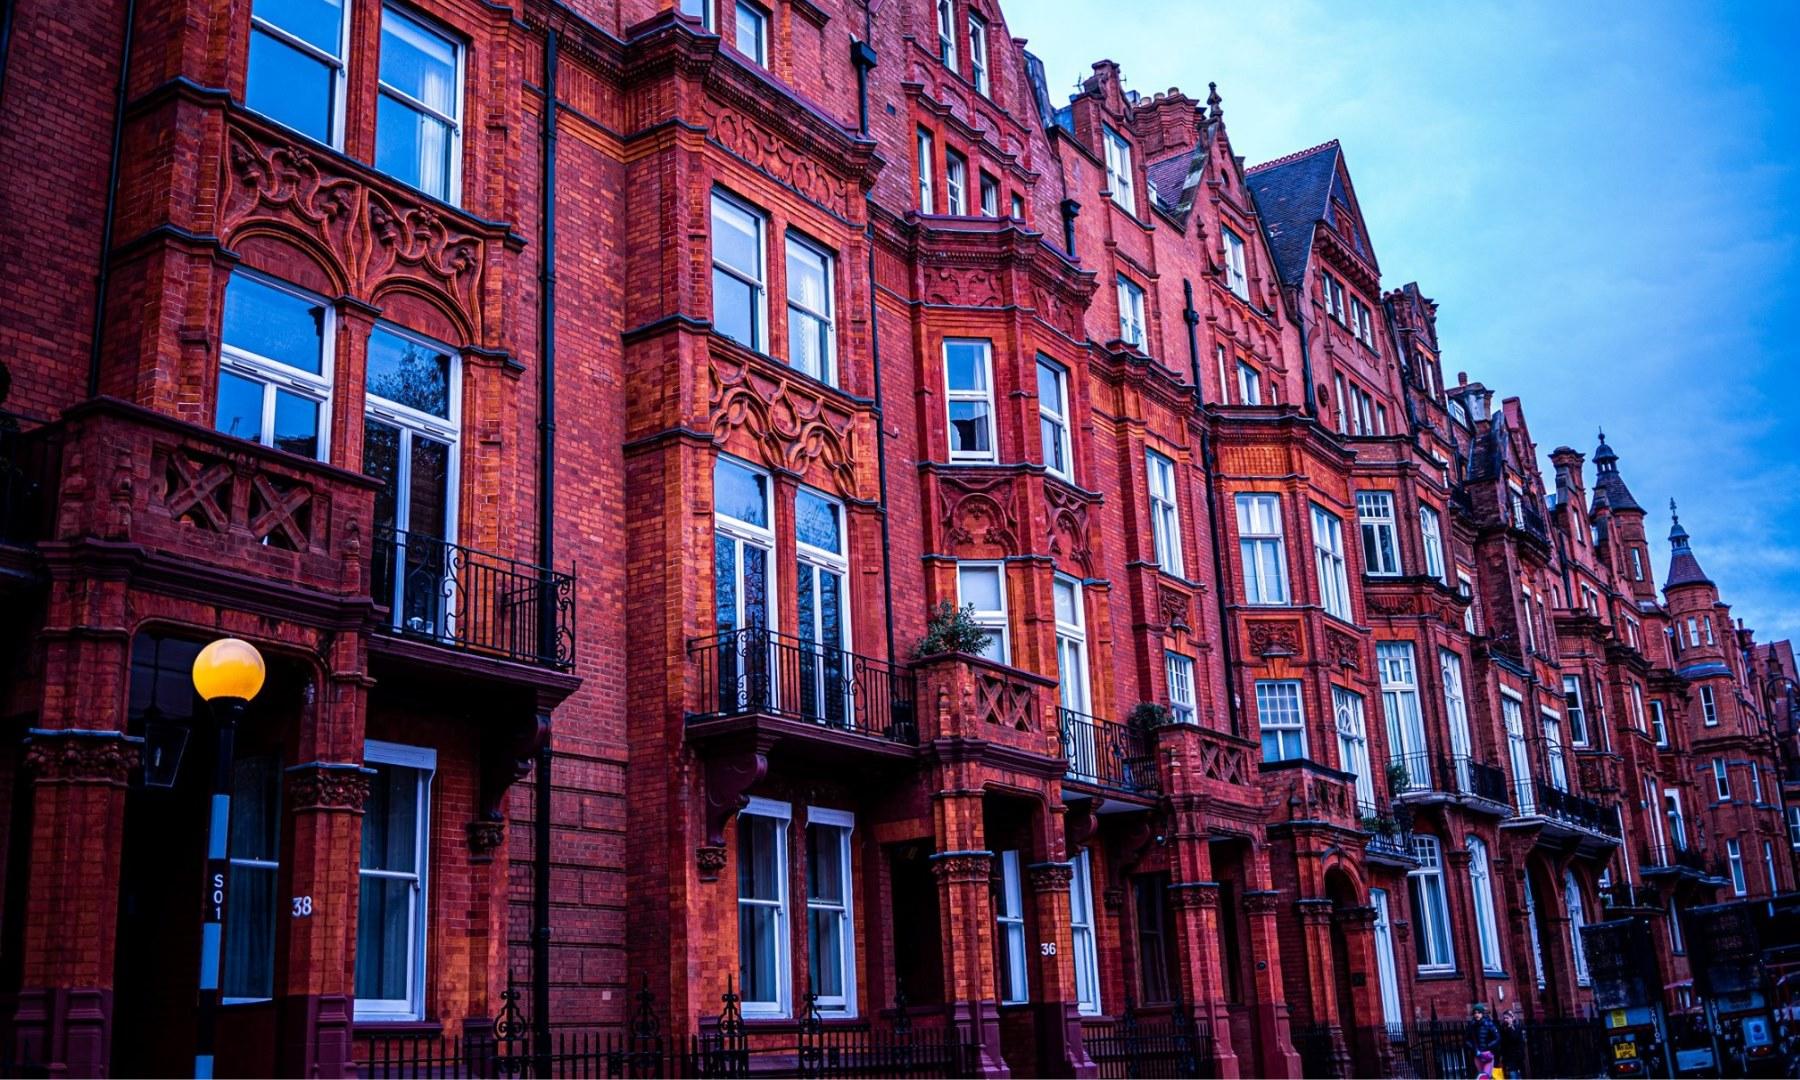 Pont Street block in Chelsea, West London